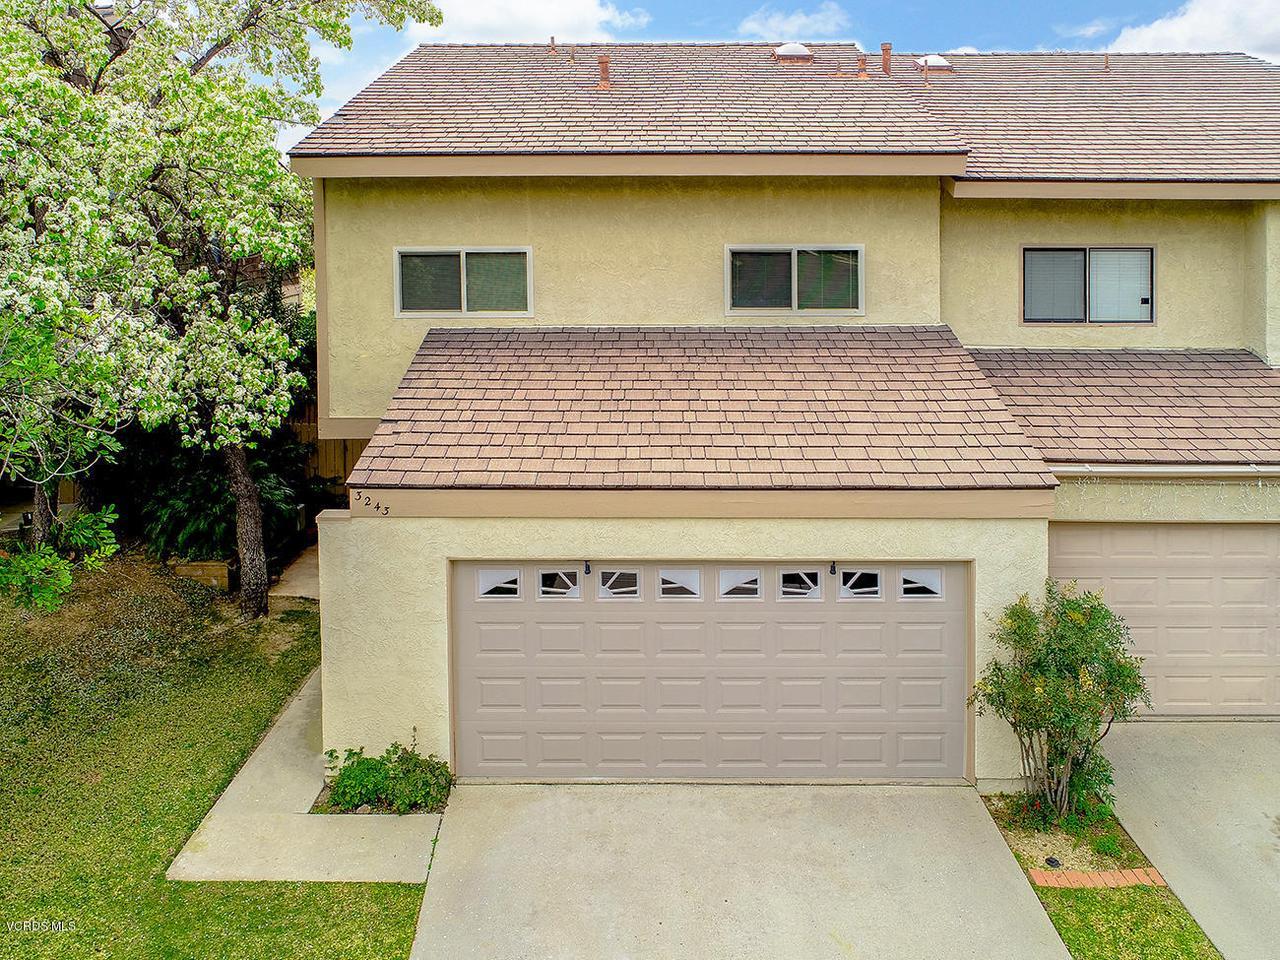 Photo of 3243 SUNBURST PLACE, Thousand Oaks, CA 91360